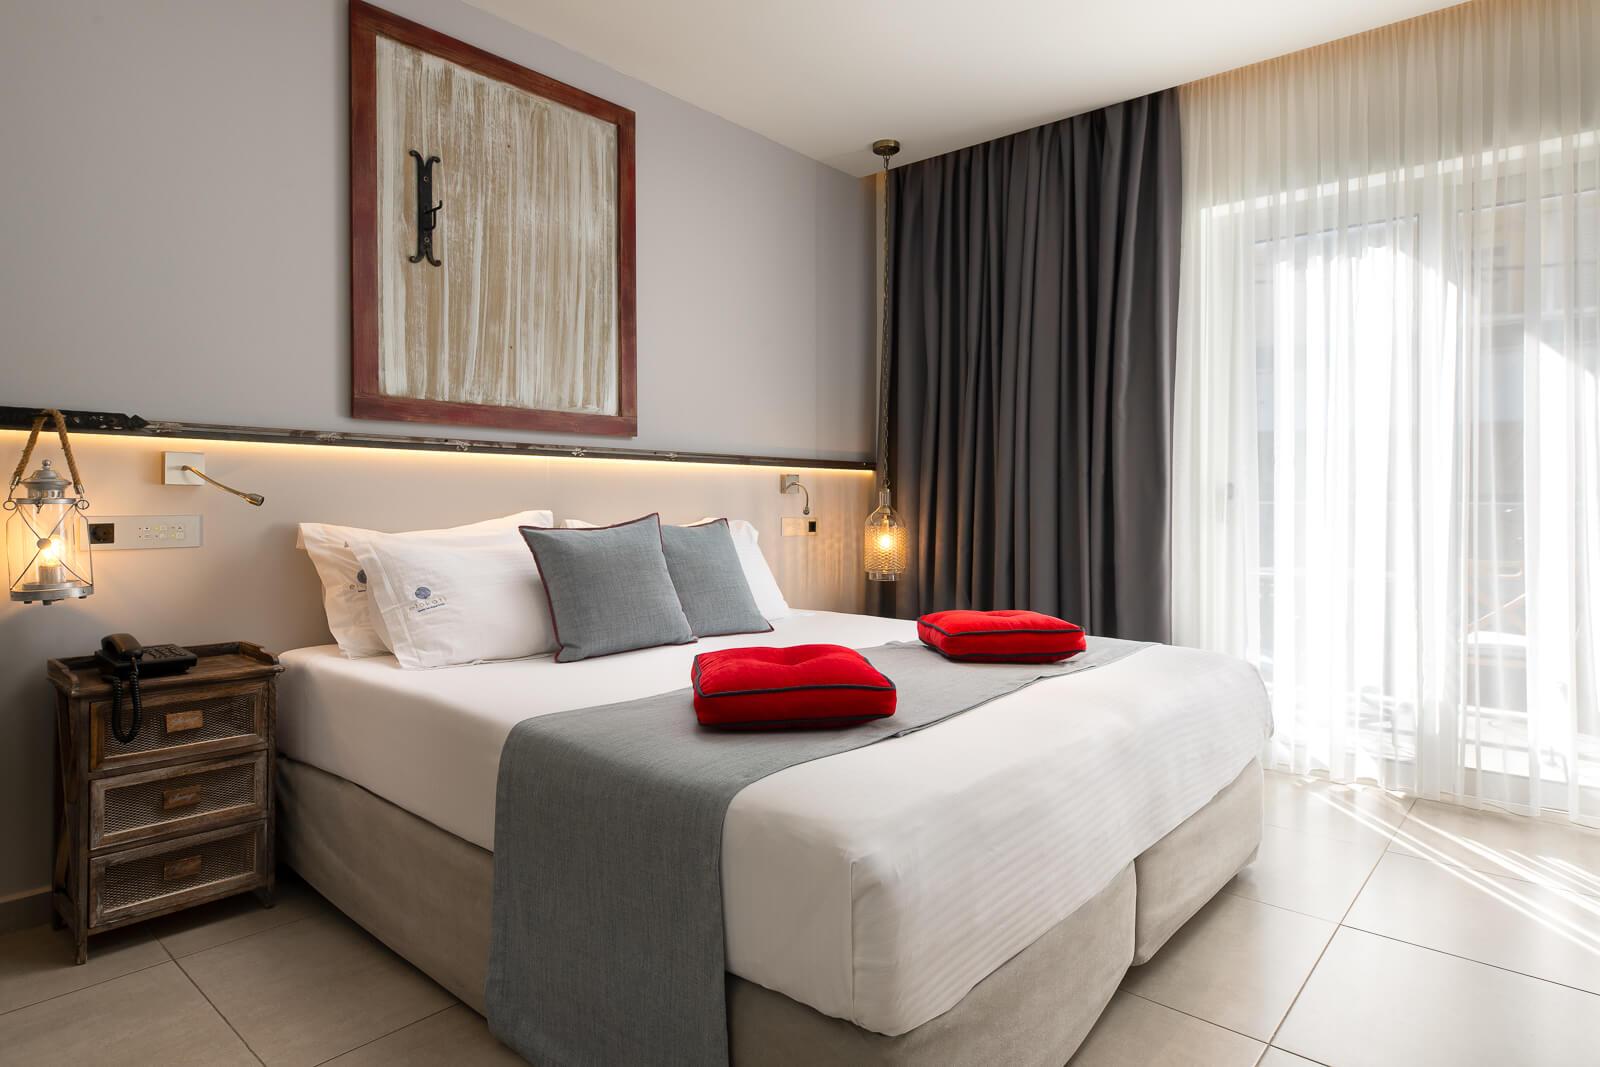 Gerani-Hotel-Room-Elakati-Hotel-in-Rhodes